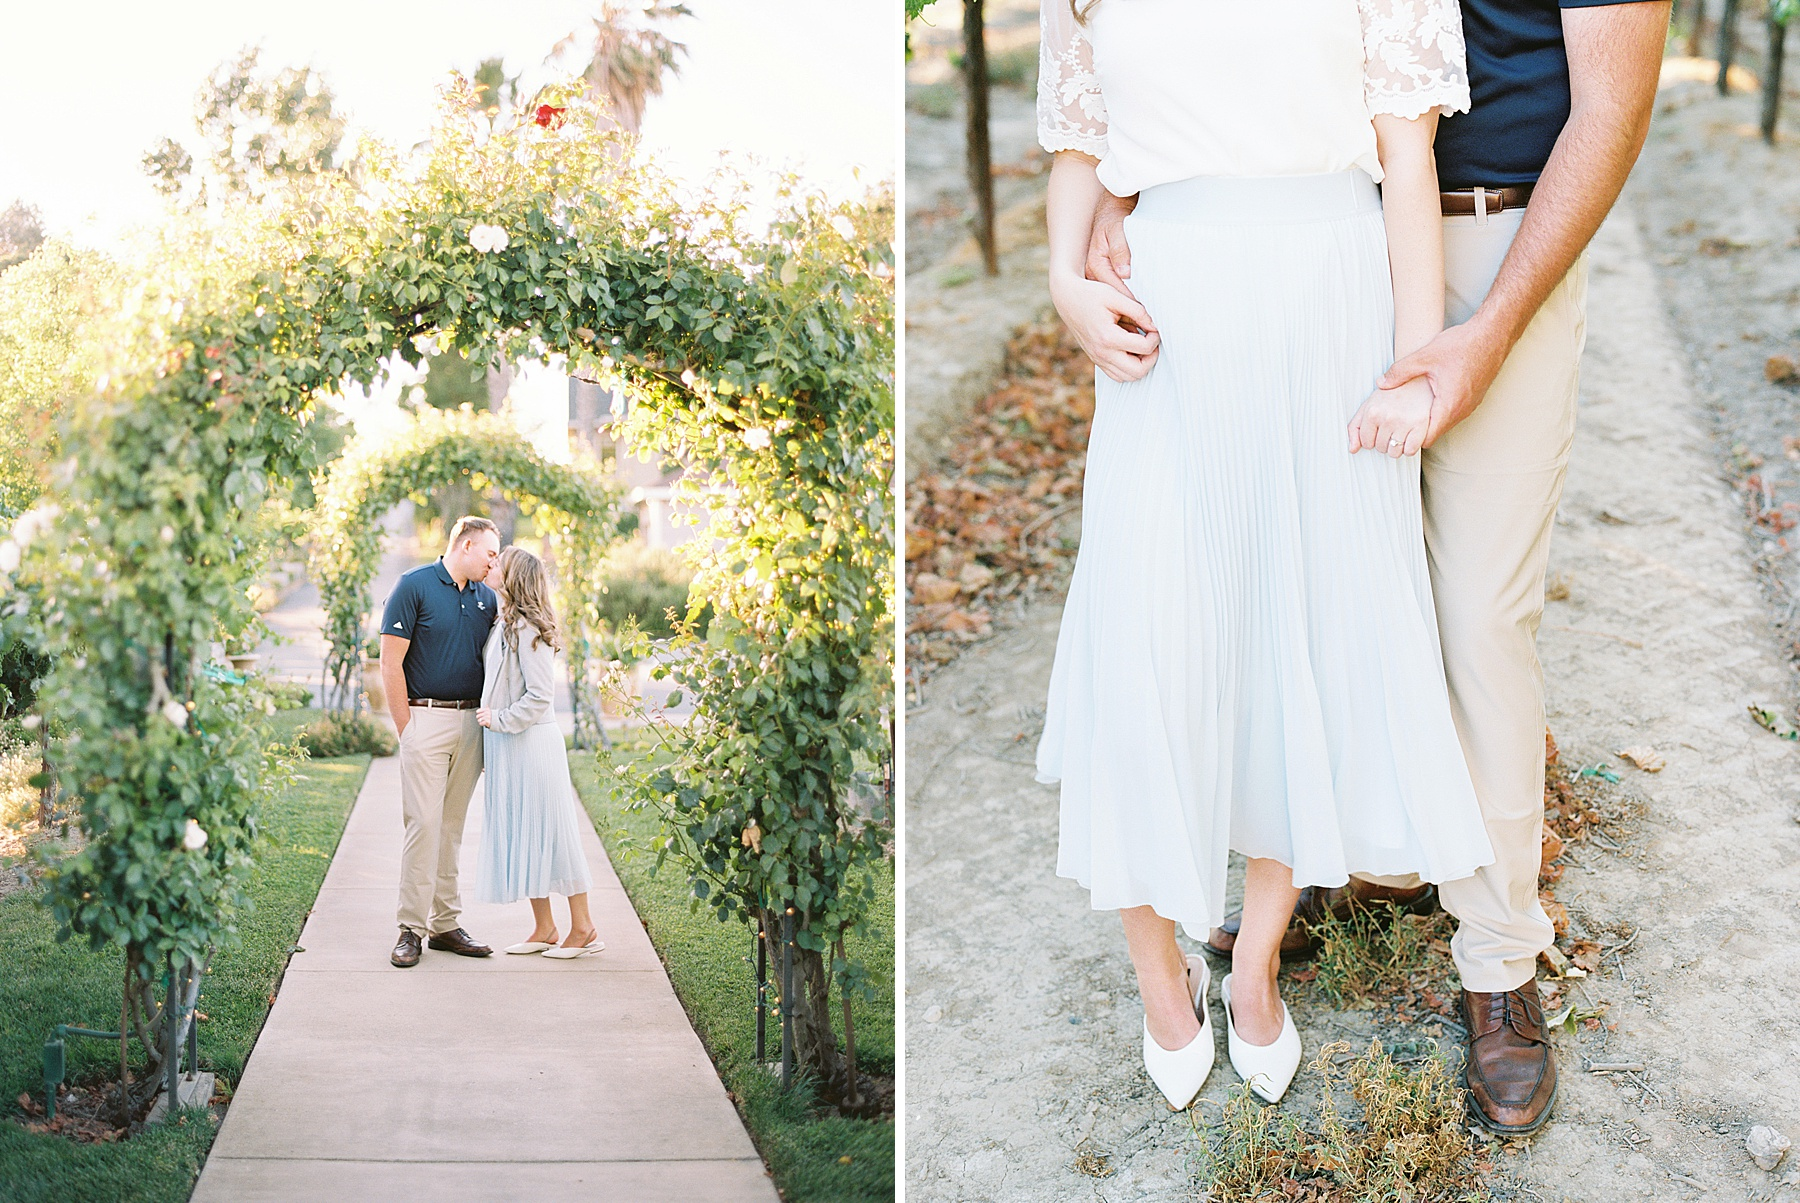 Scribner Bend Winery Engagement Session - Courtney and Steven - Ashley Baumgartner - Sribner Bend Wedding Photographer - Sacramento Wedding Photographer_0020.jpg